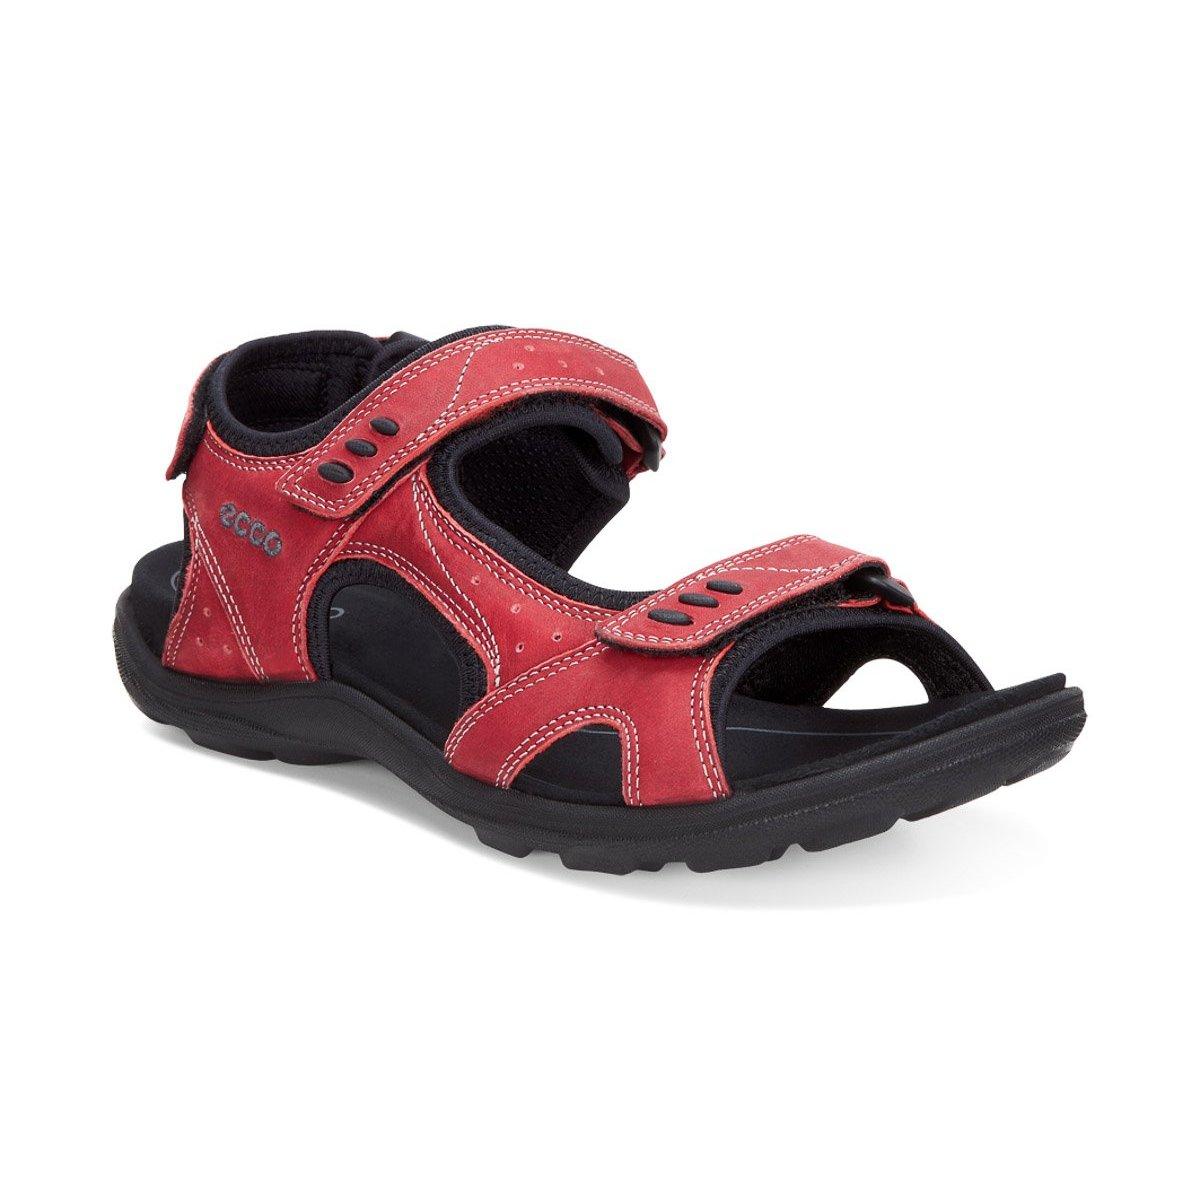 ECCO Kana rot | Schuhe Online Kaufen Onlineshop